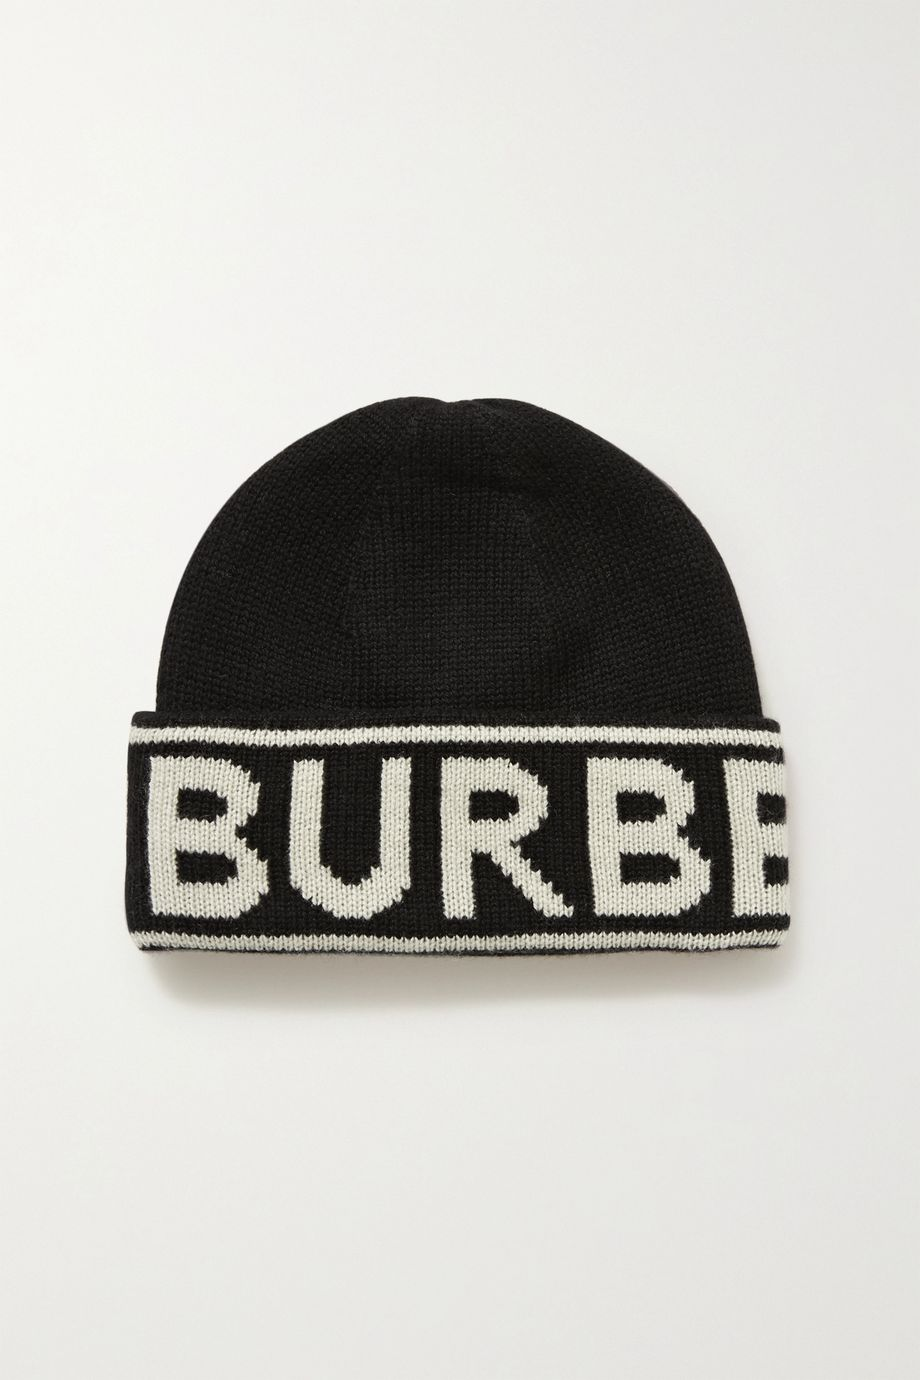 Burberry 嵌花羊绒毛线帽